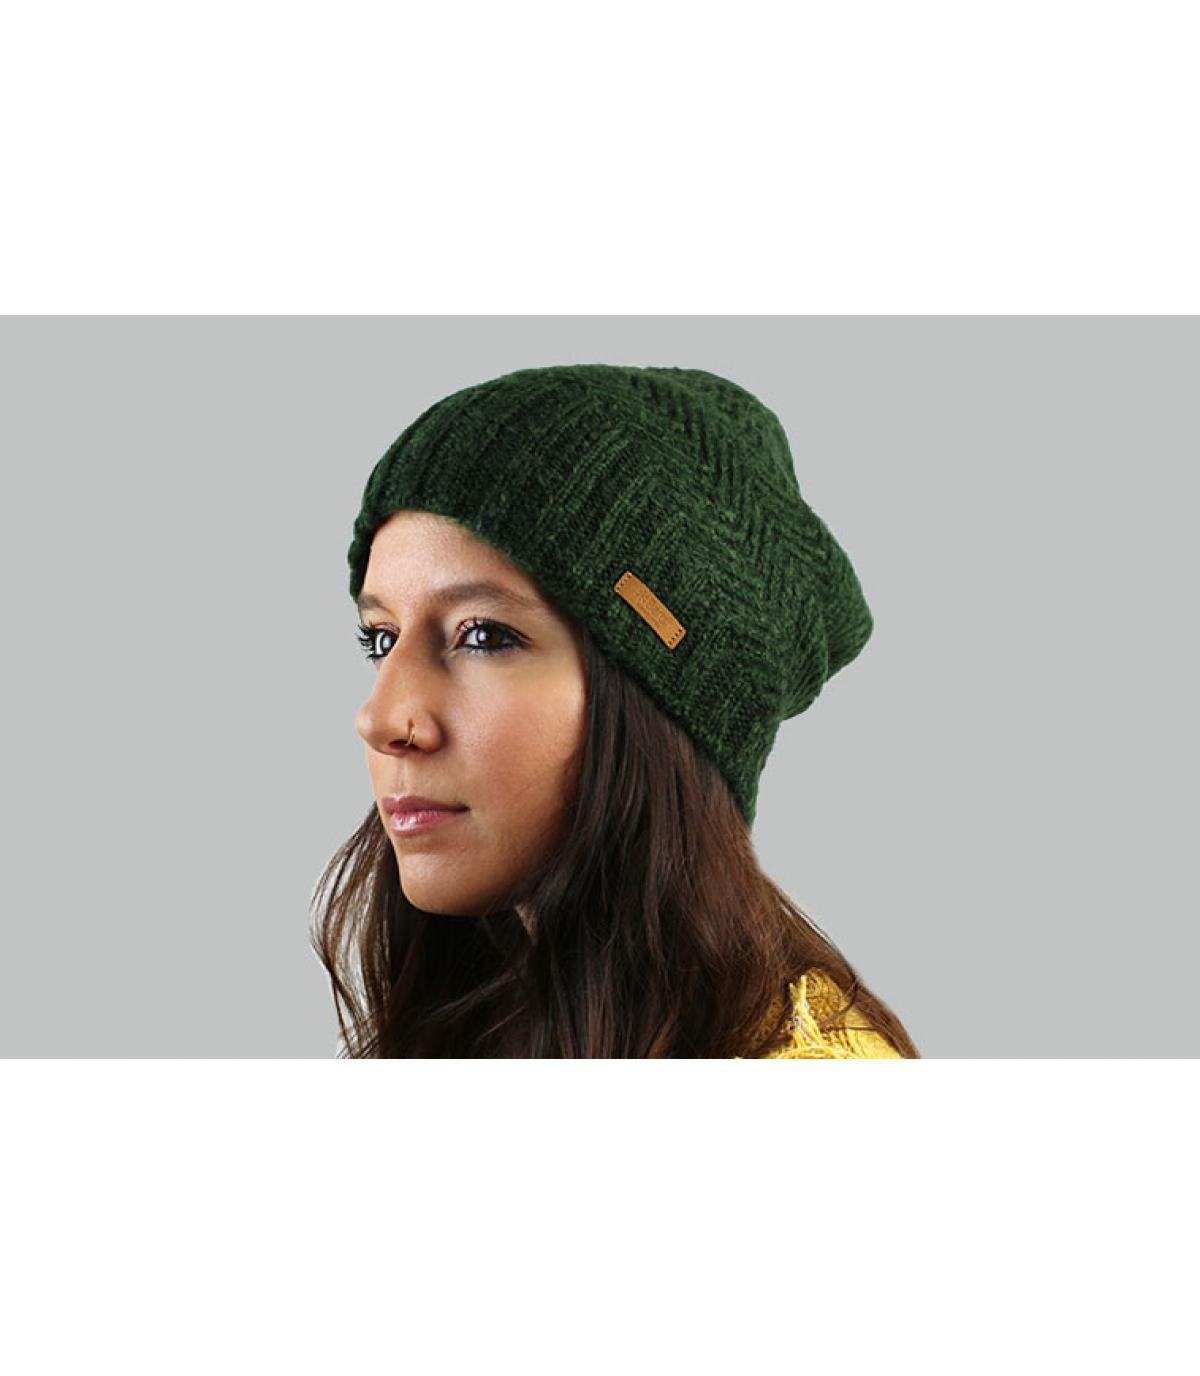 Barts lungo cappello verde